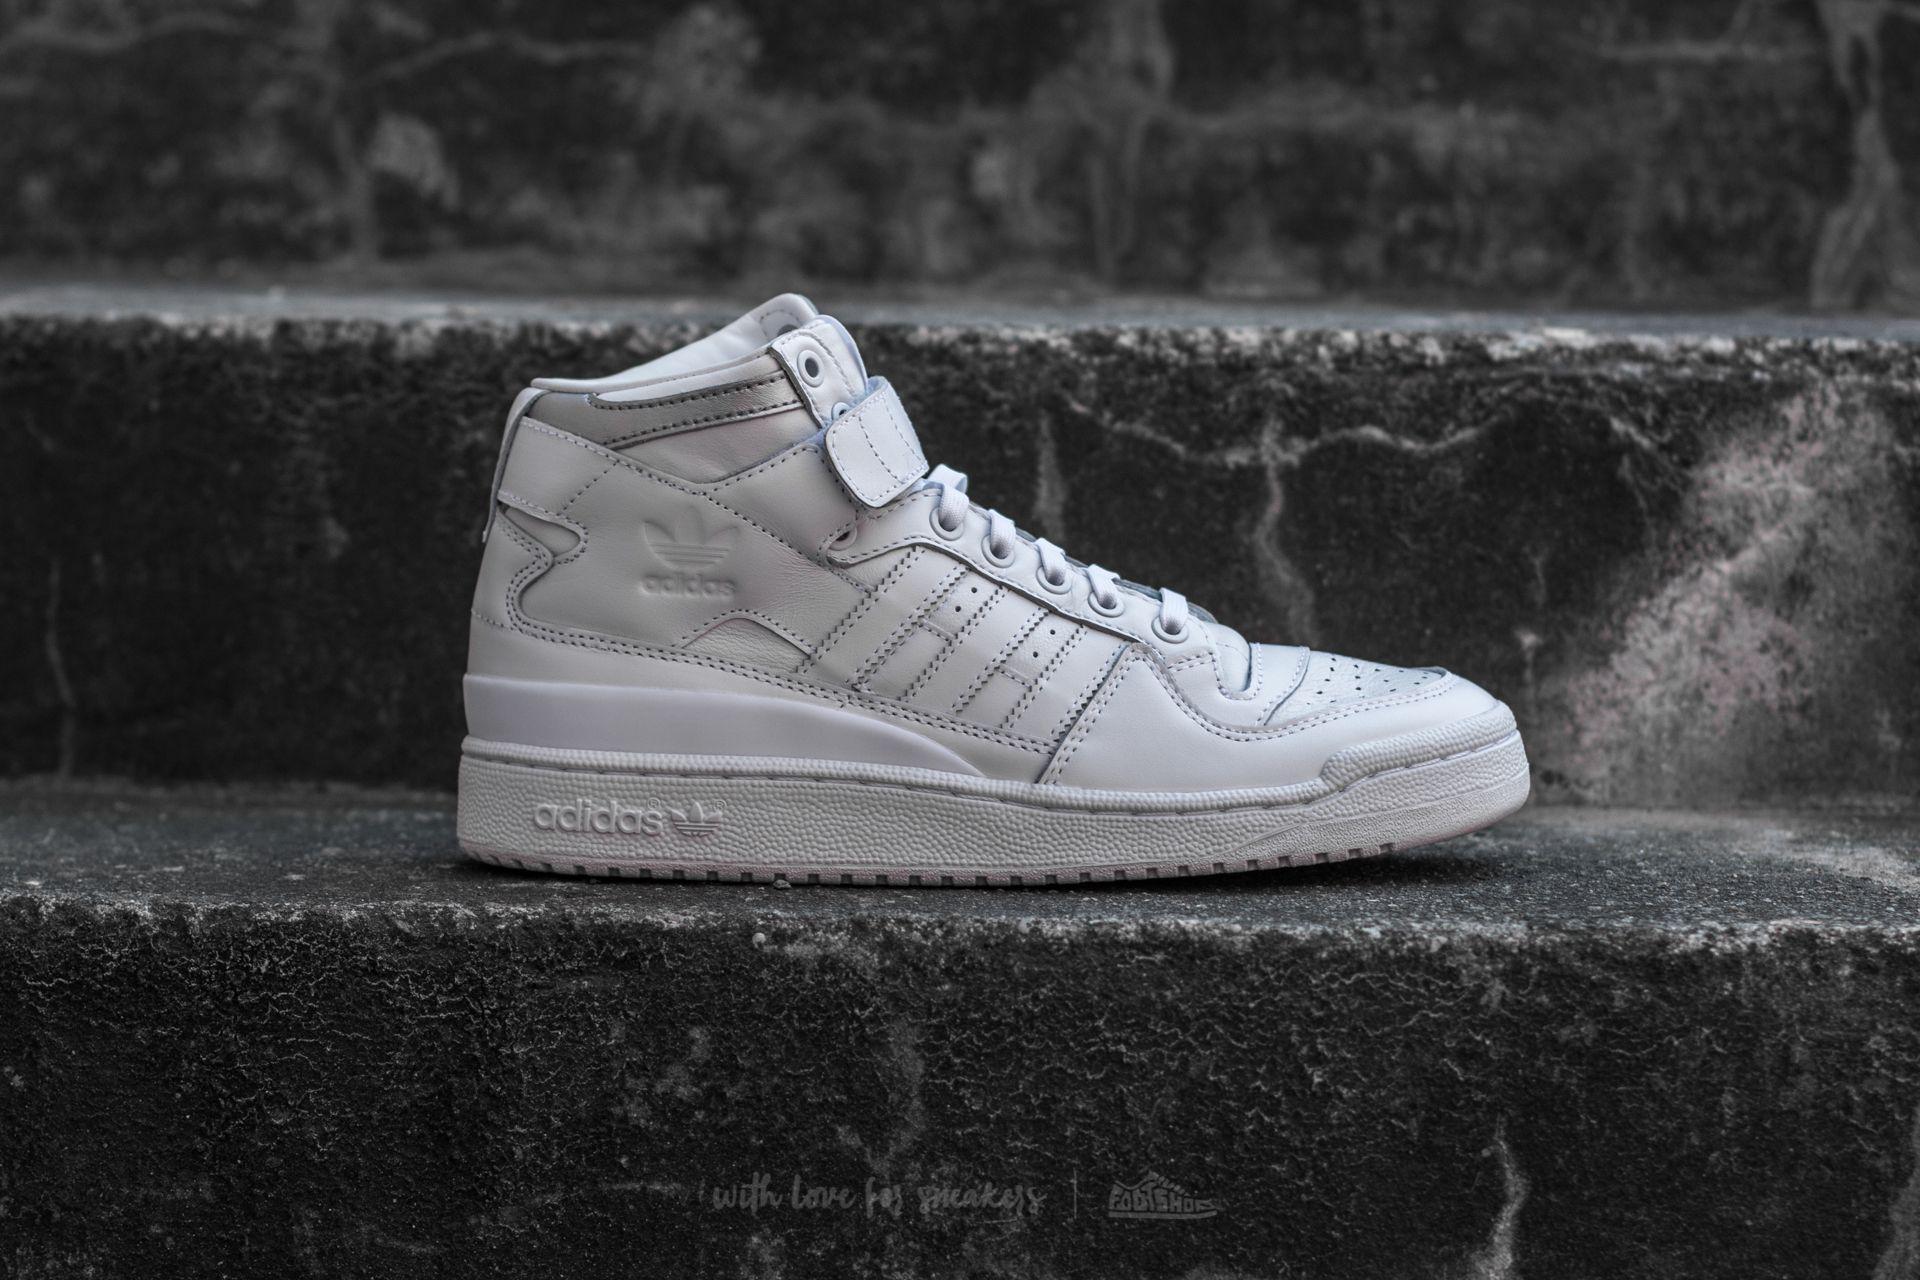 the best attitude 68776 5de24 Lyst - adidas Originals Adidas Forum Mid Refined Footwear White ...